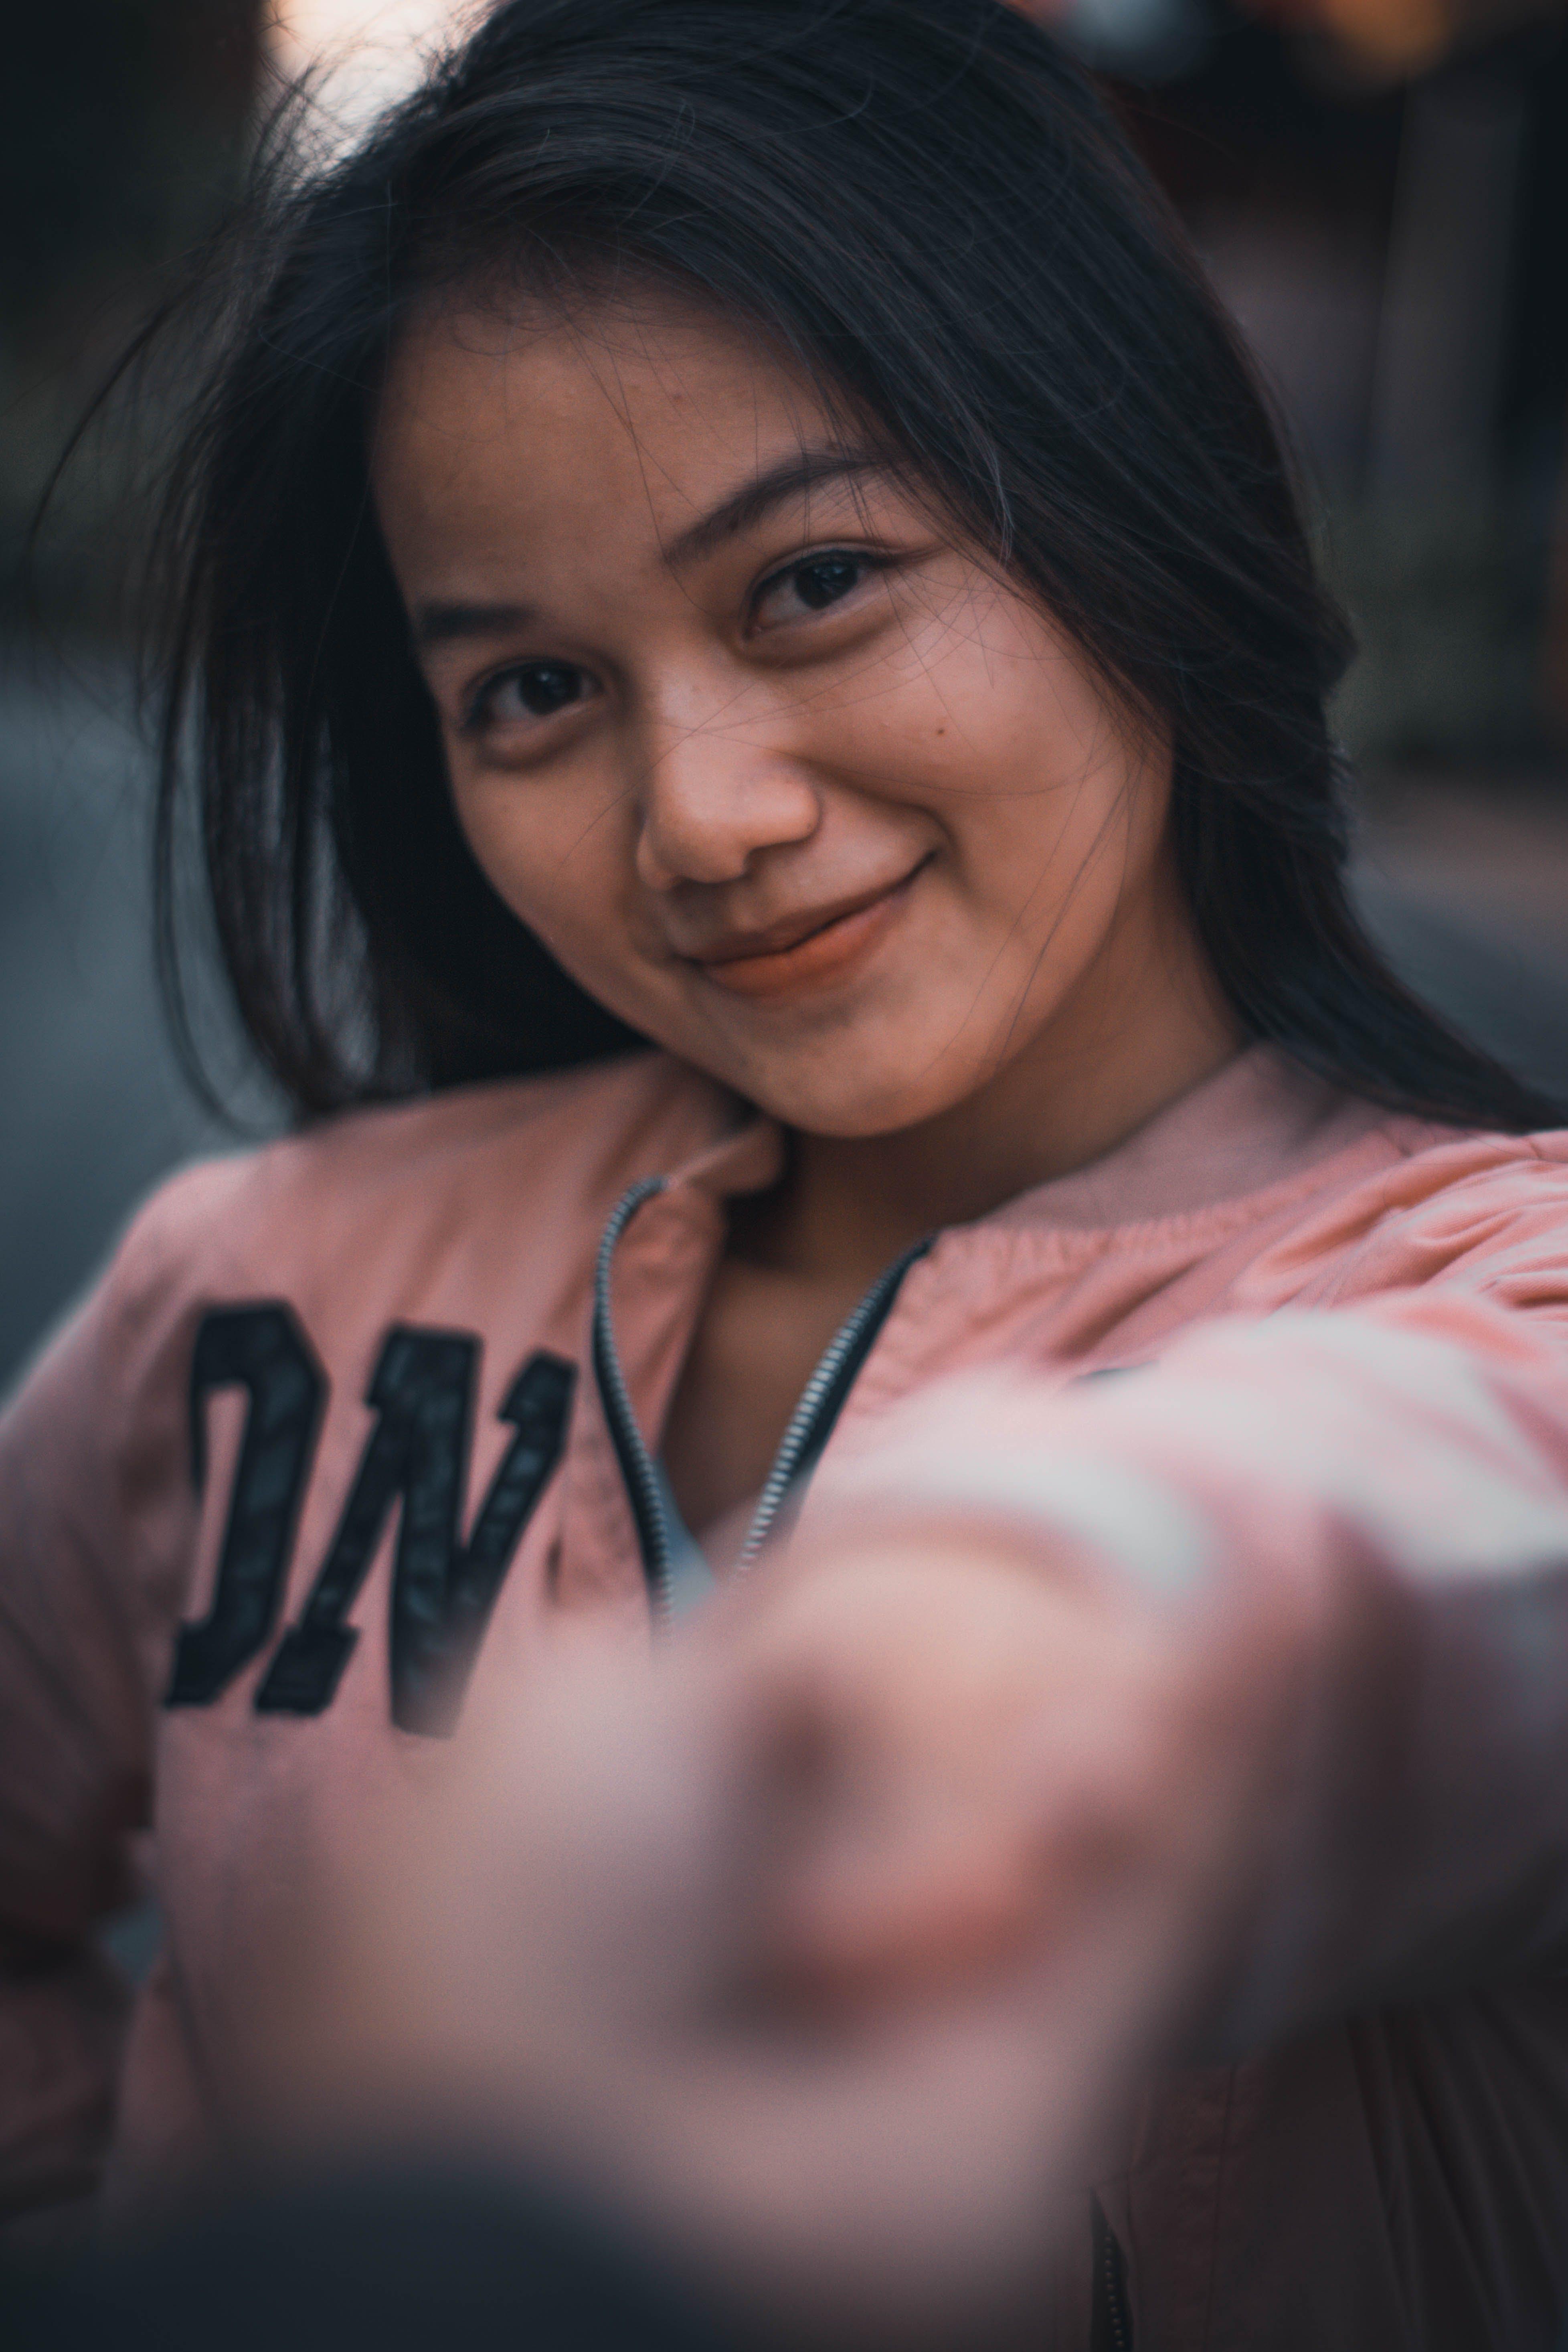 Woman in Pink Zip-up Jacket